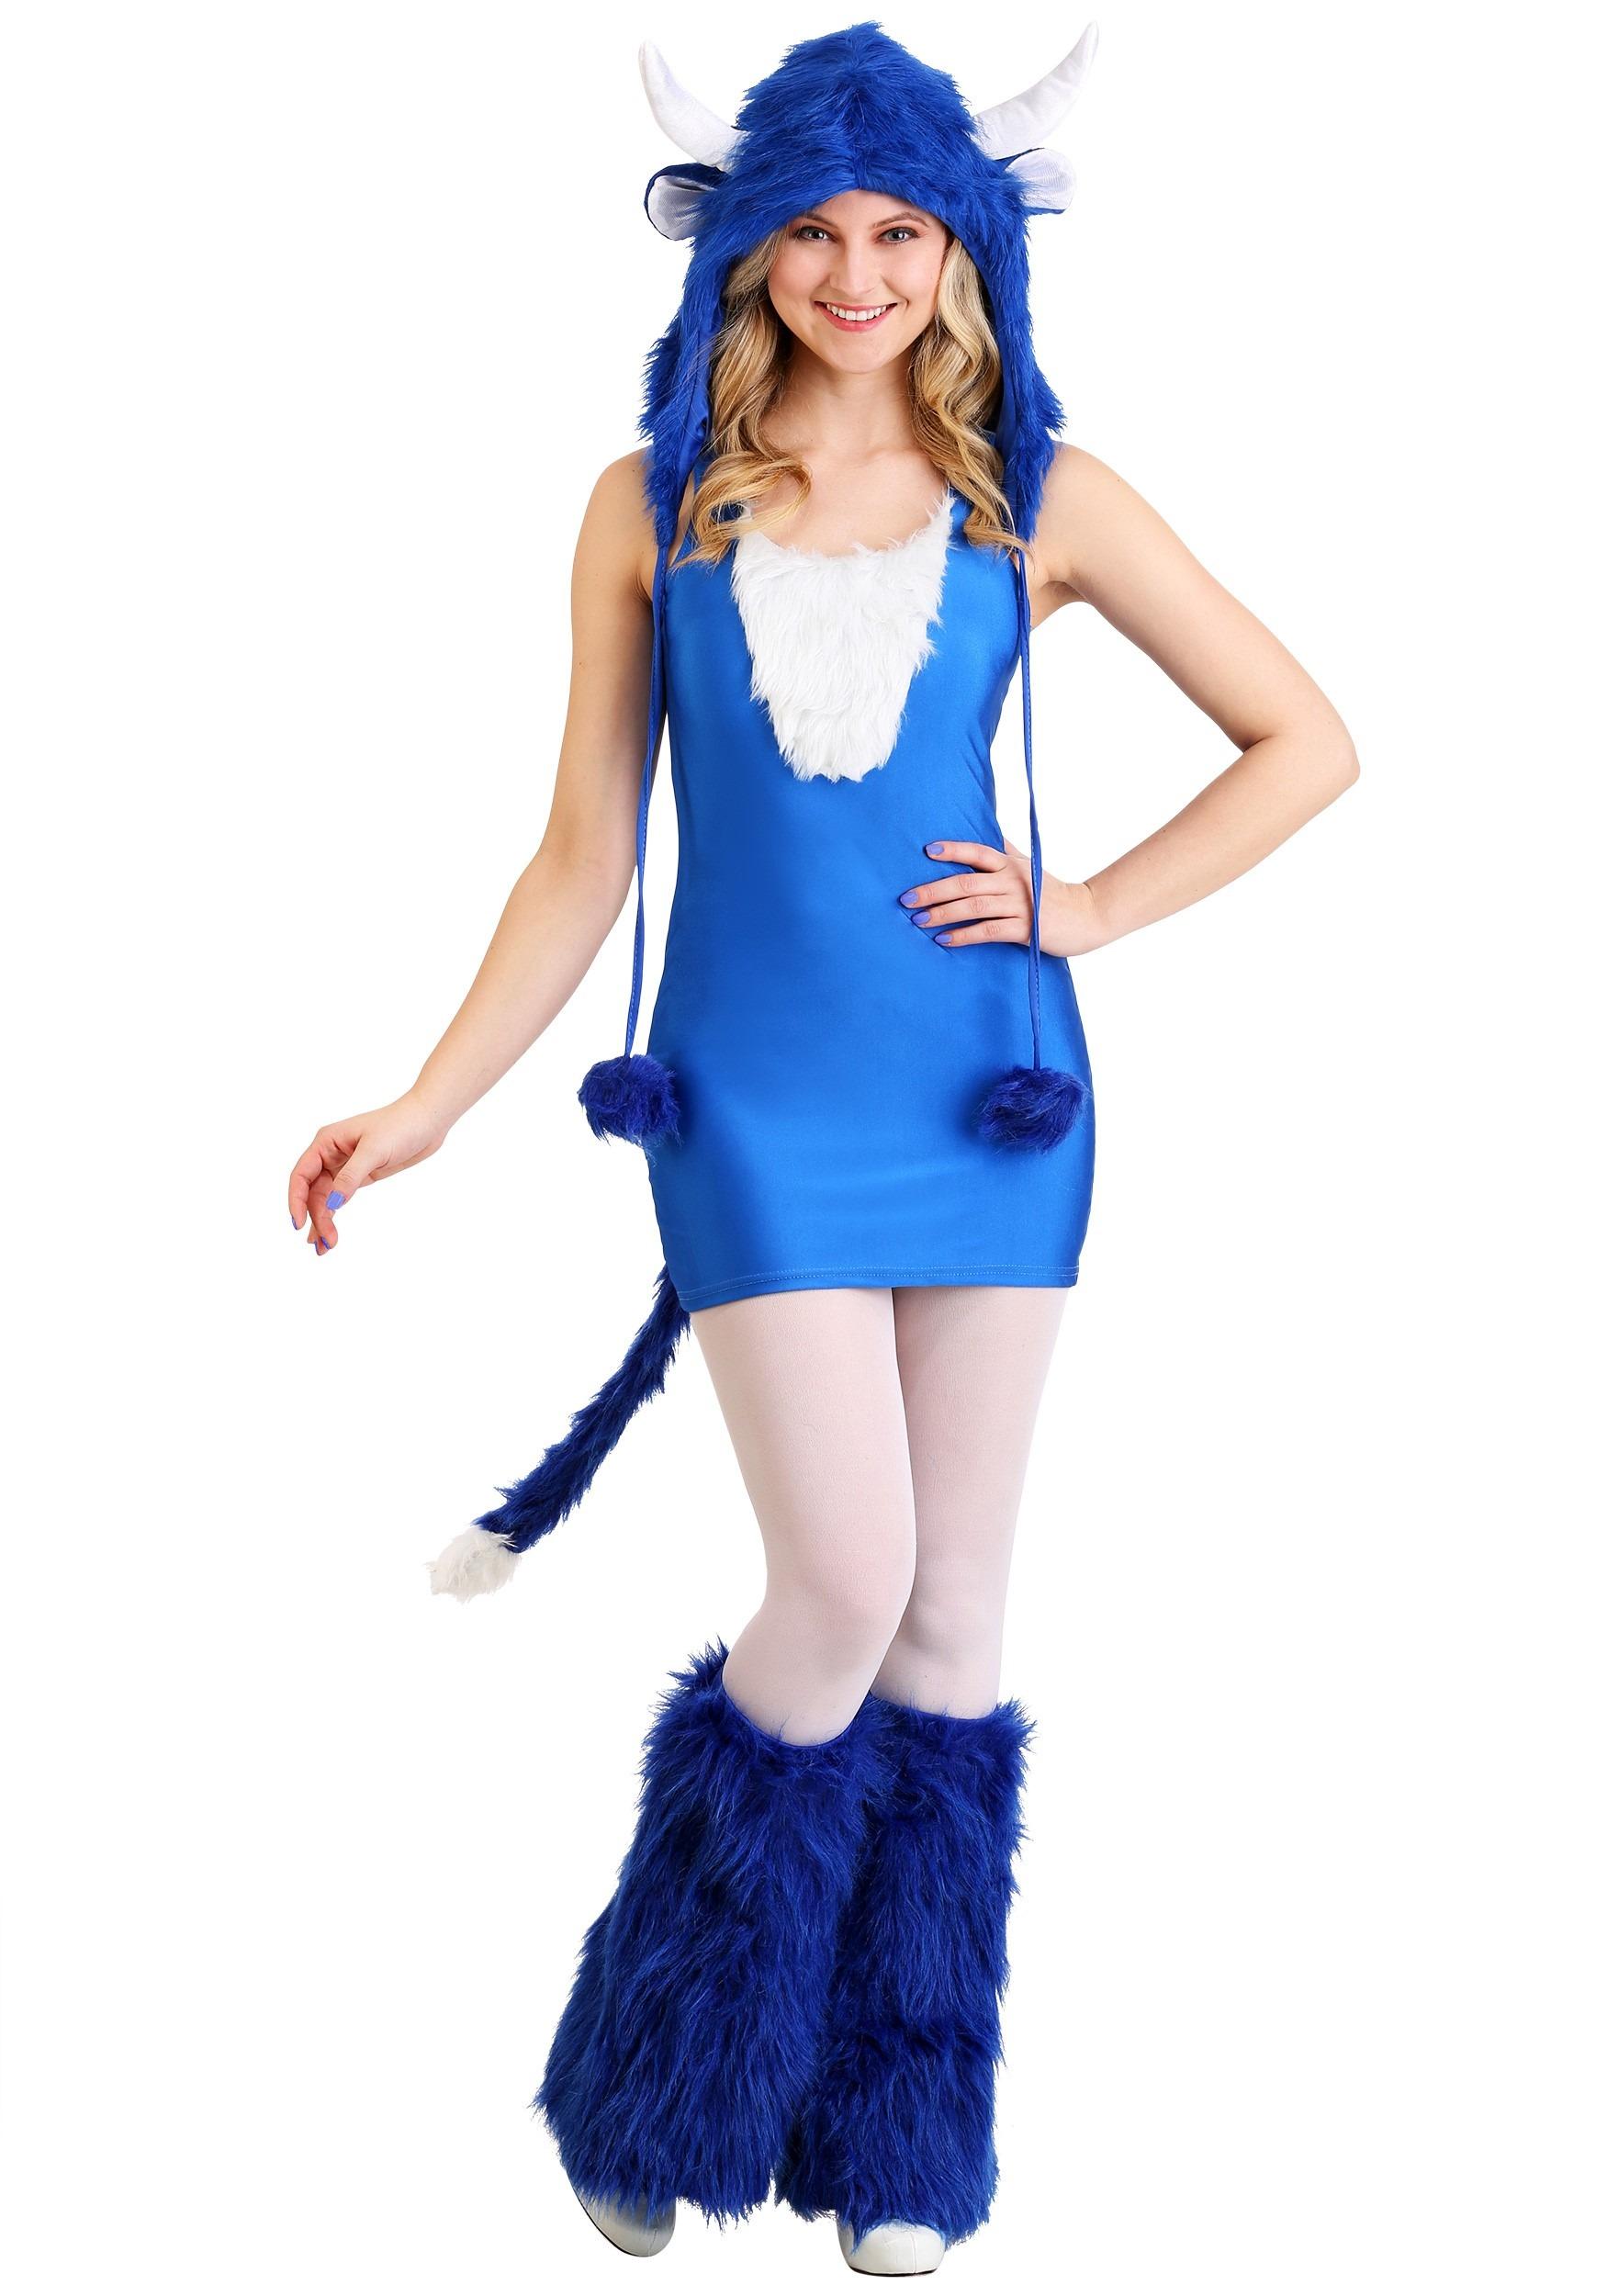 49cc1e0b4 Sexy Babe the Blue Ox Costume Update Main